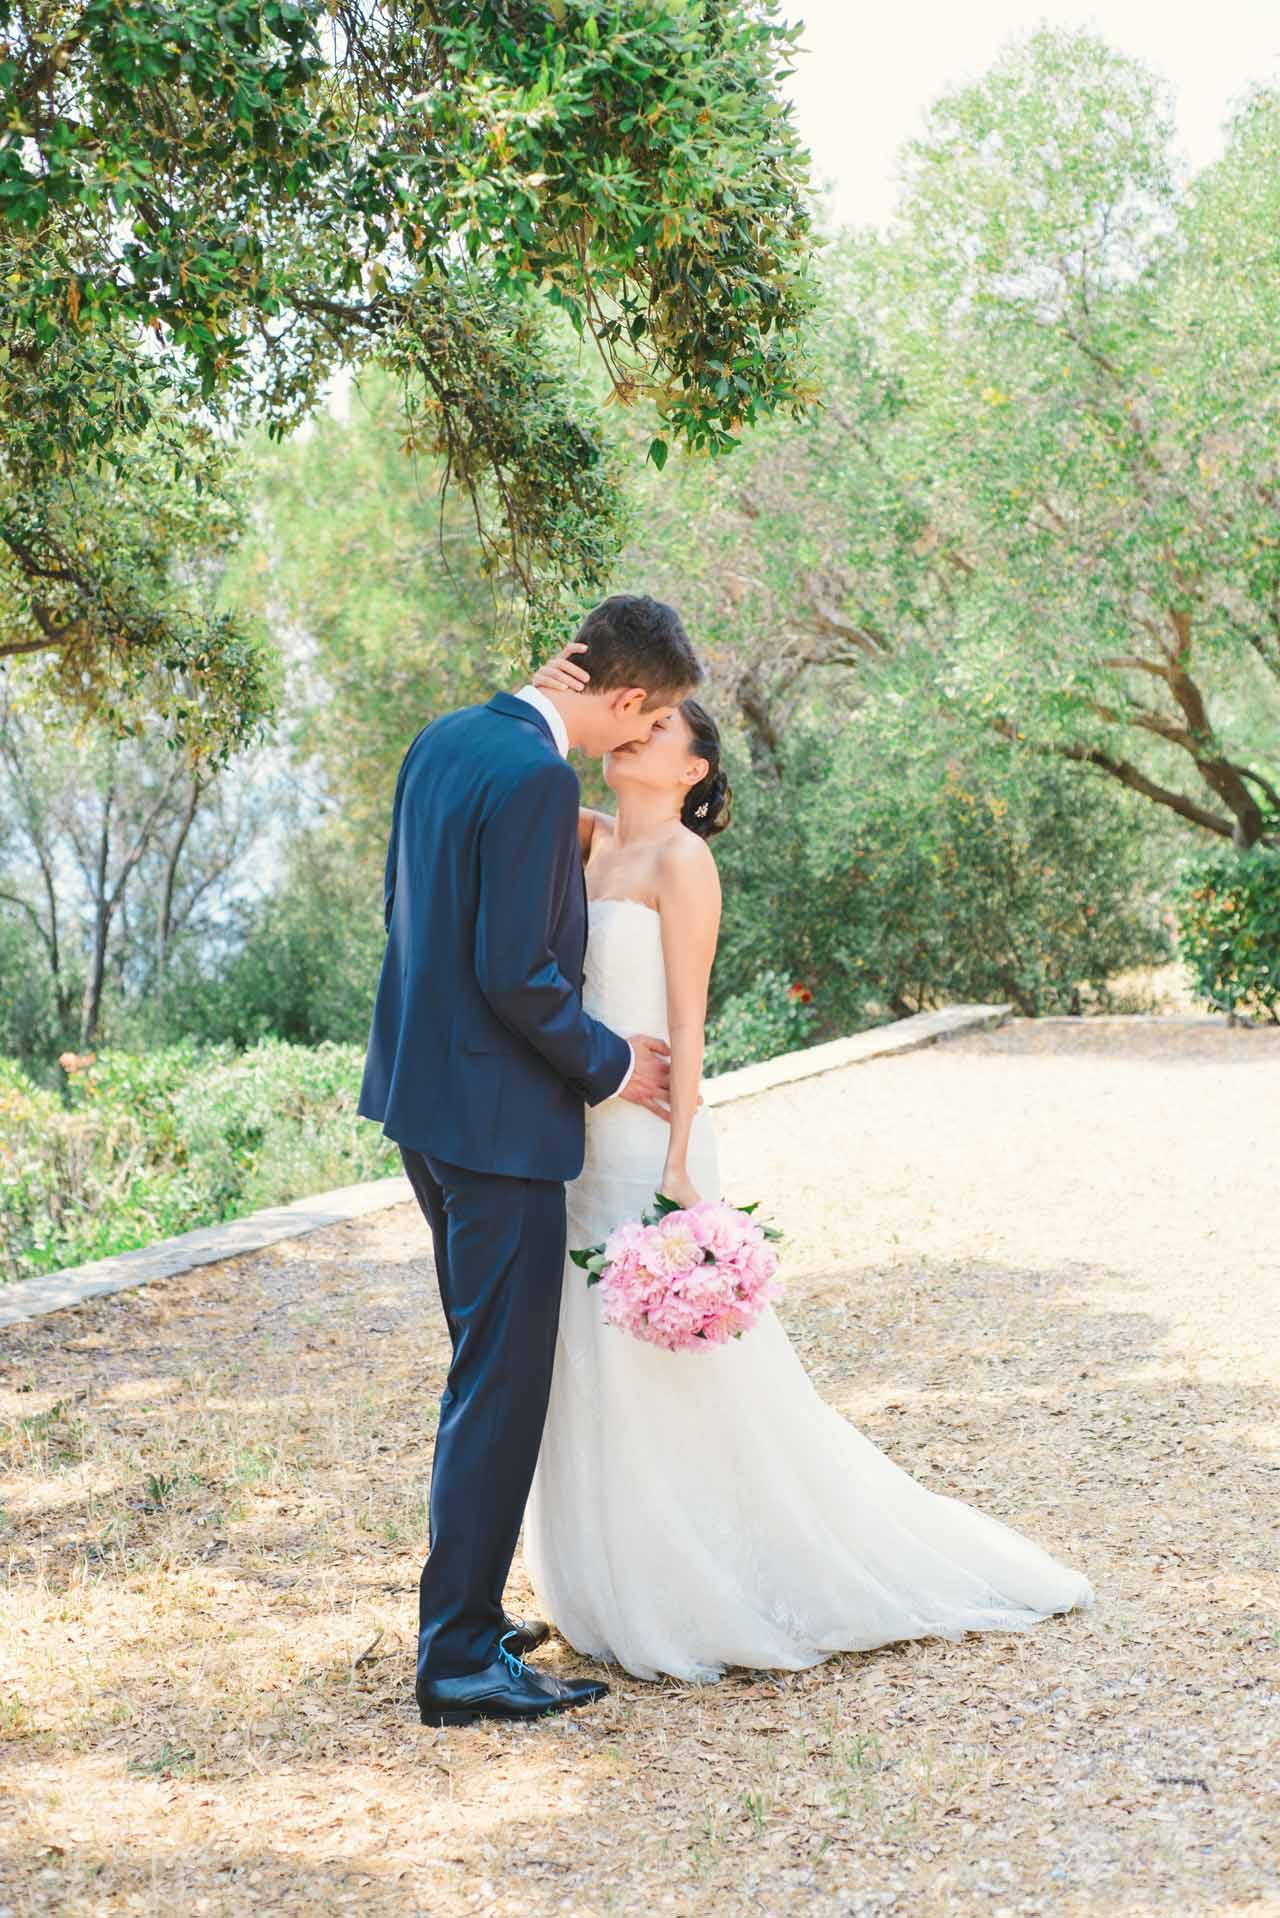 Mariage-romantique-en-provence-celine-chhuon-photography (61).JPG